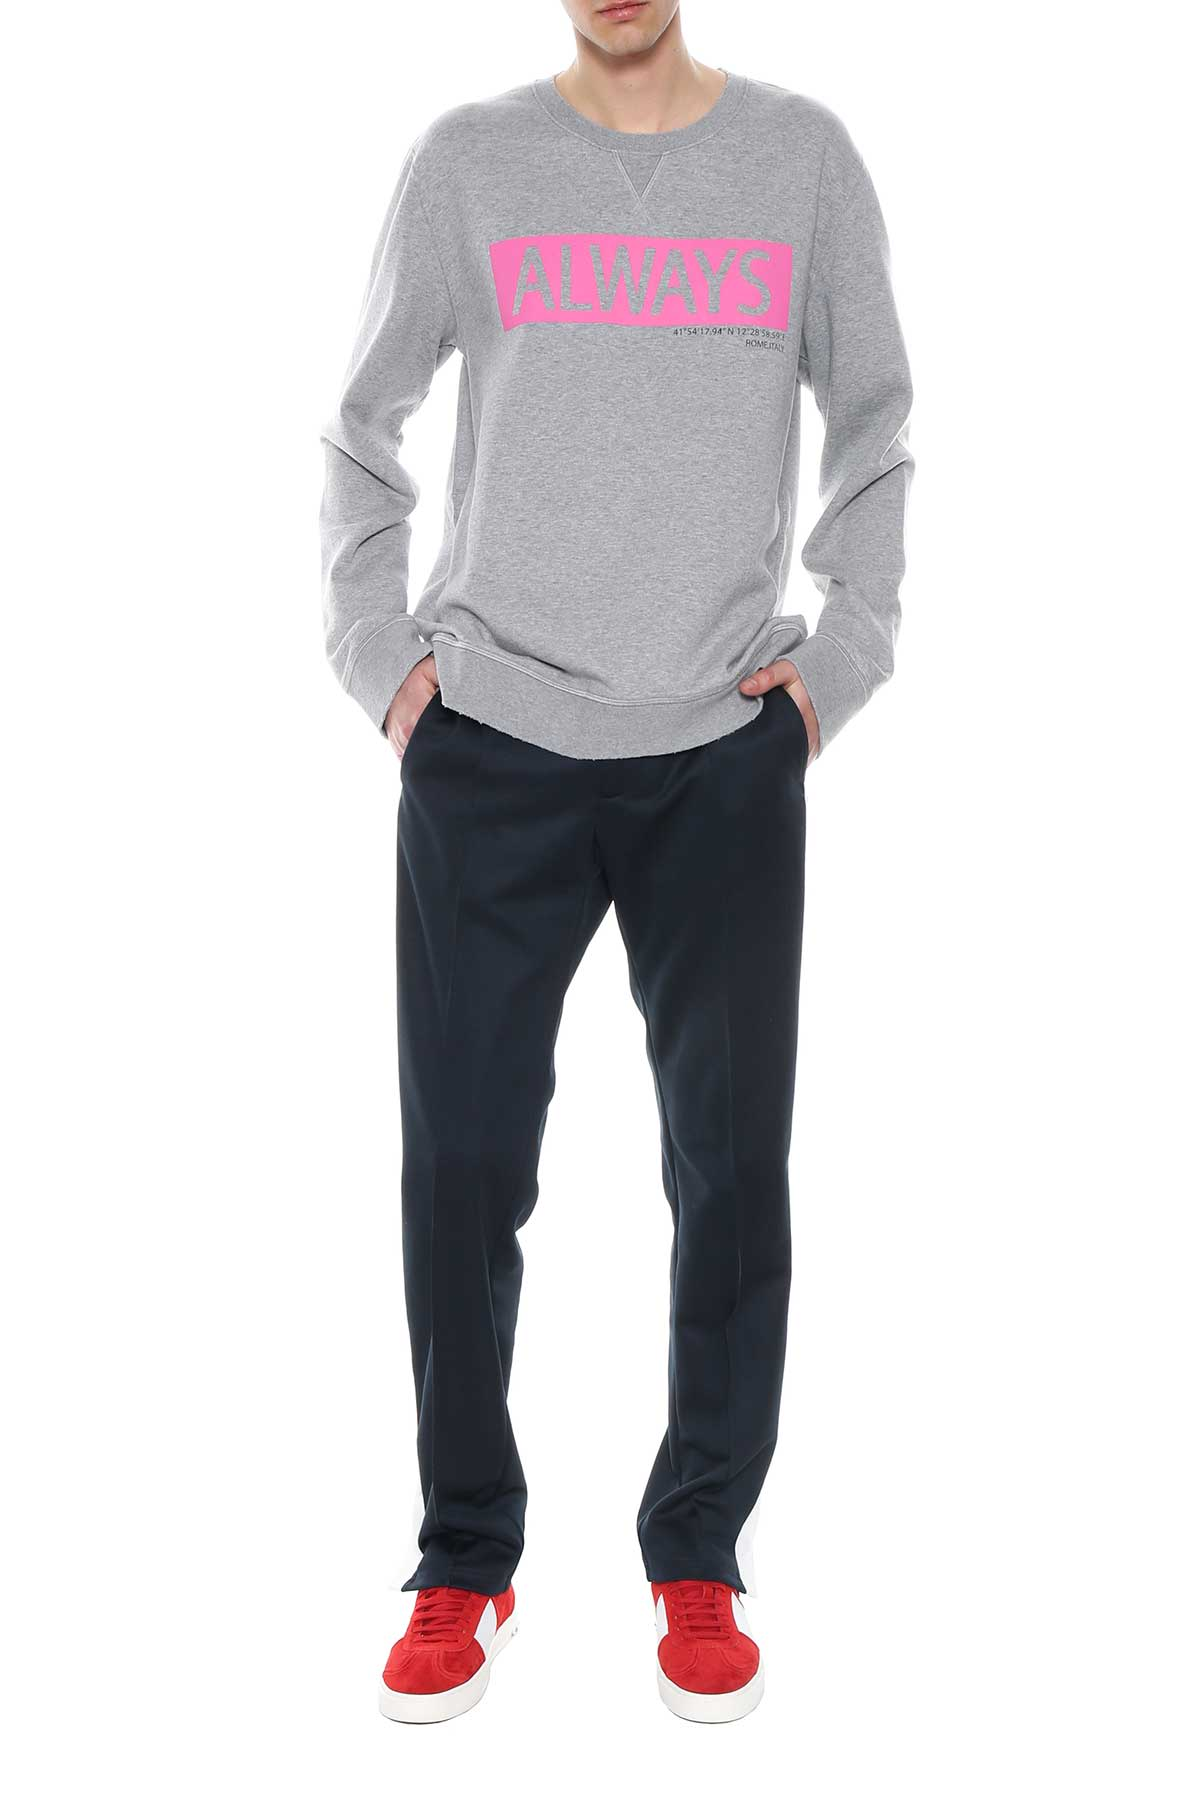 Valentino Valentino always Print Sweatshirt